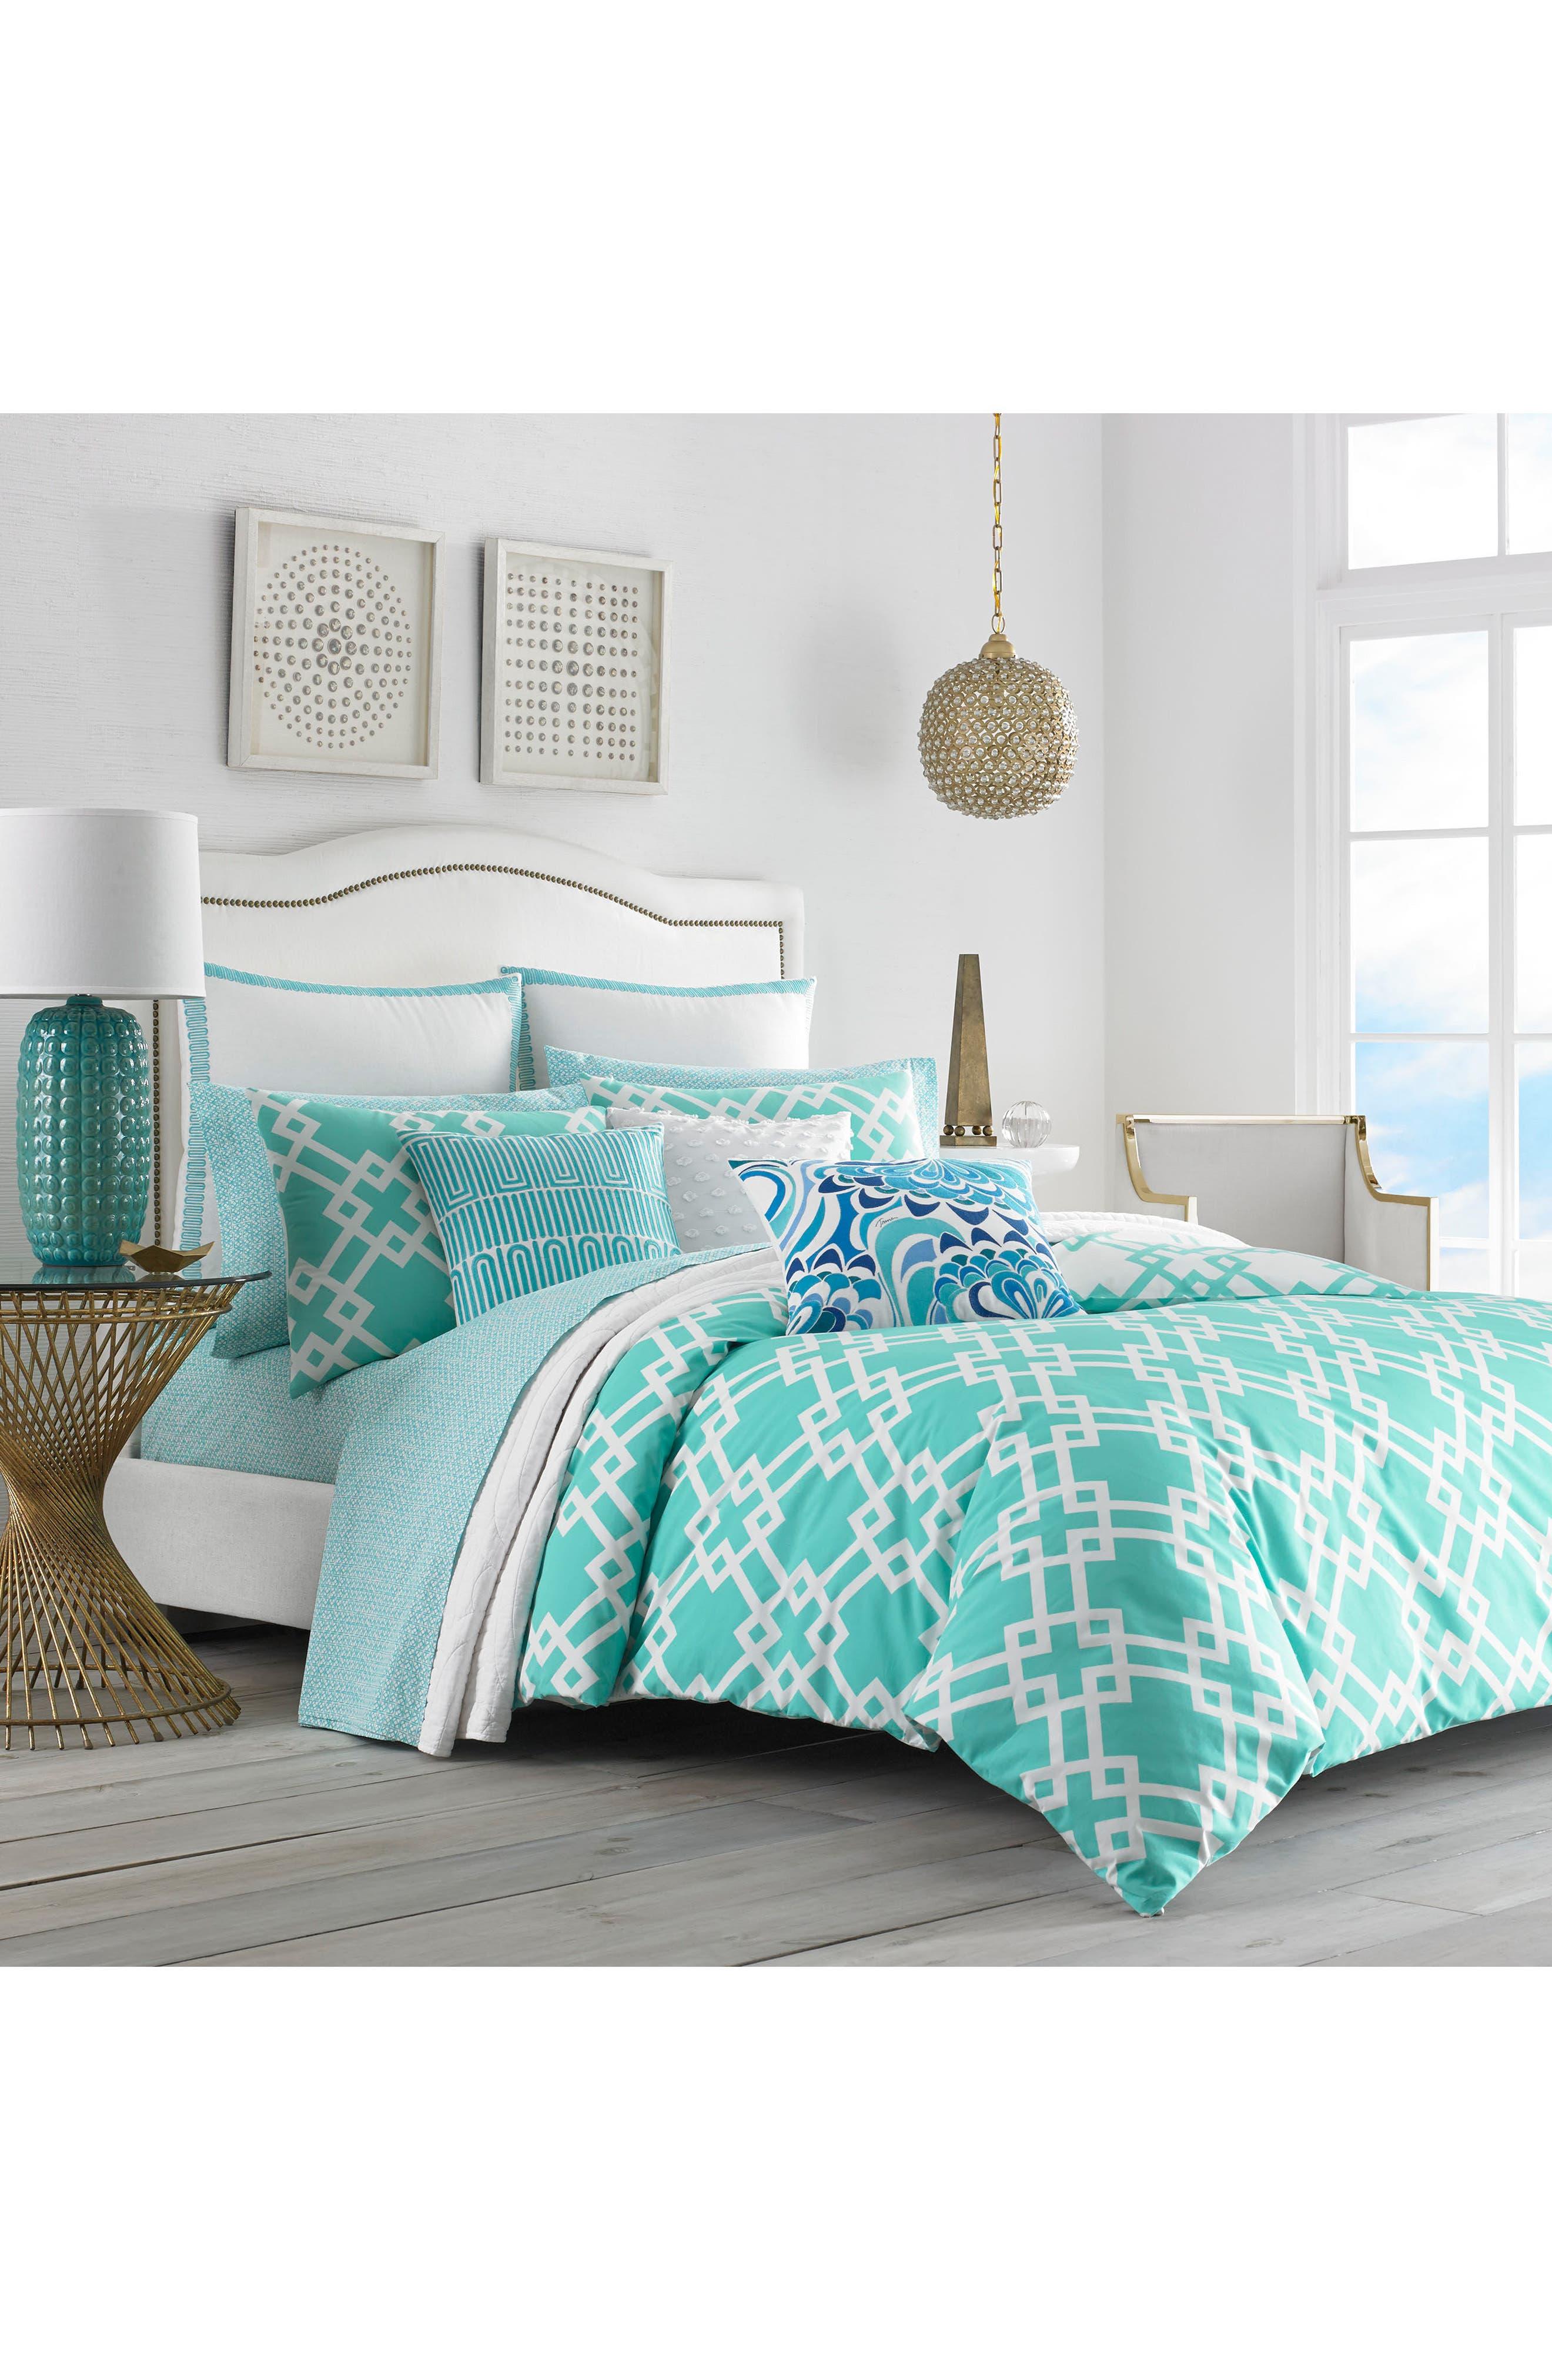 Main Image - Trina Turk Avalon Comforter & Sham Set